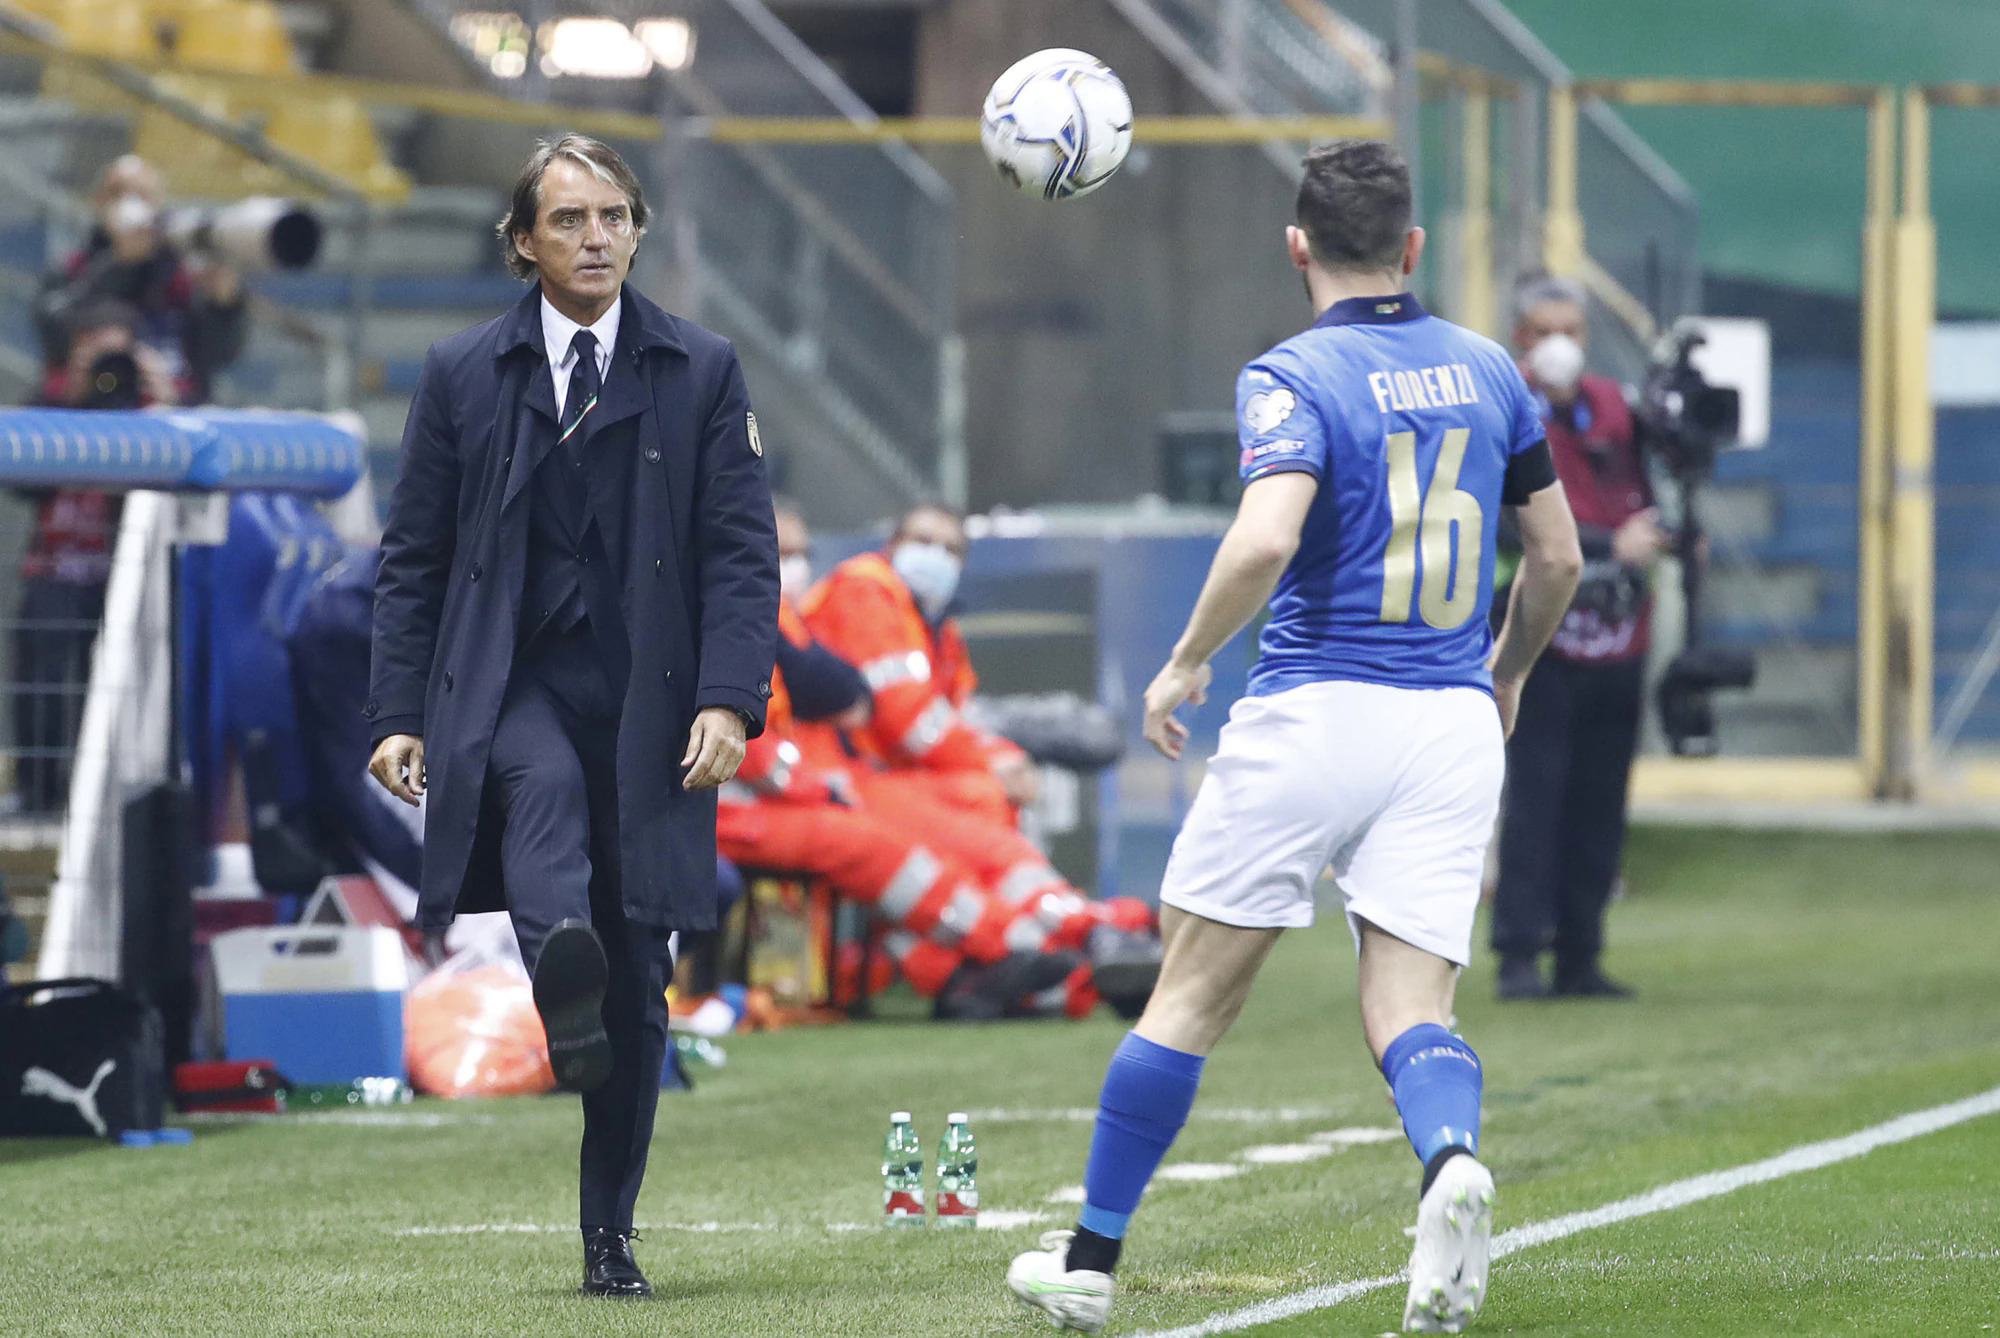 Mancini terkadang marah kepada murid-muridnya karena permainan Italia mengganggu di babak kedua.  Foto: ANSA